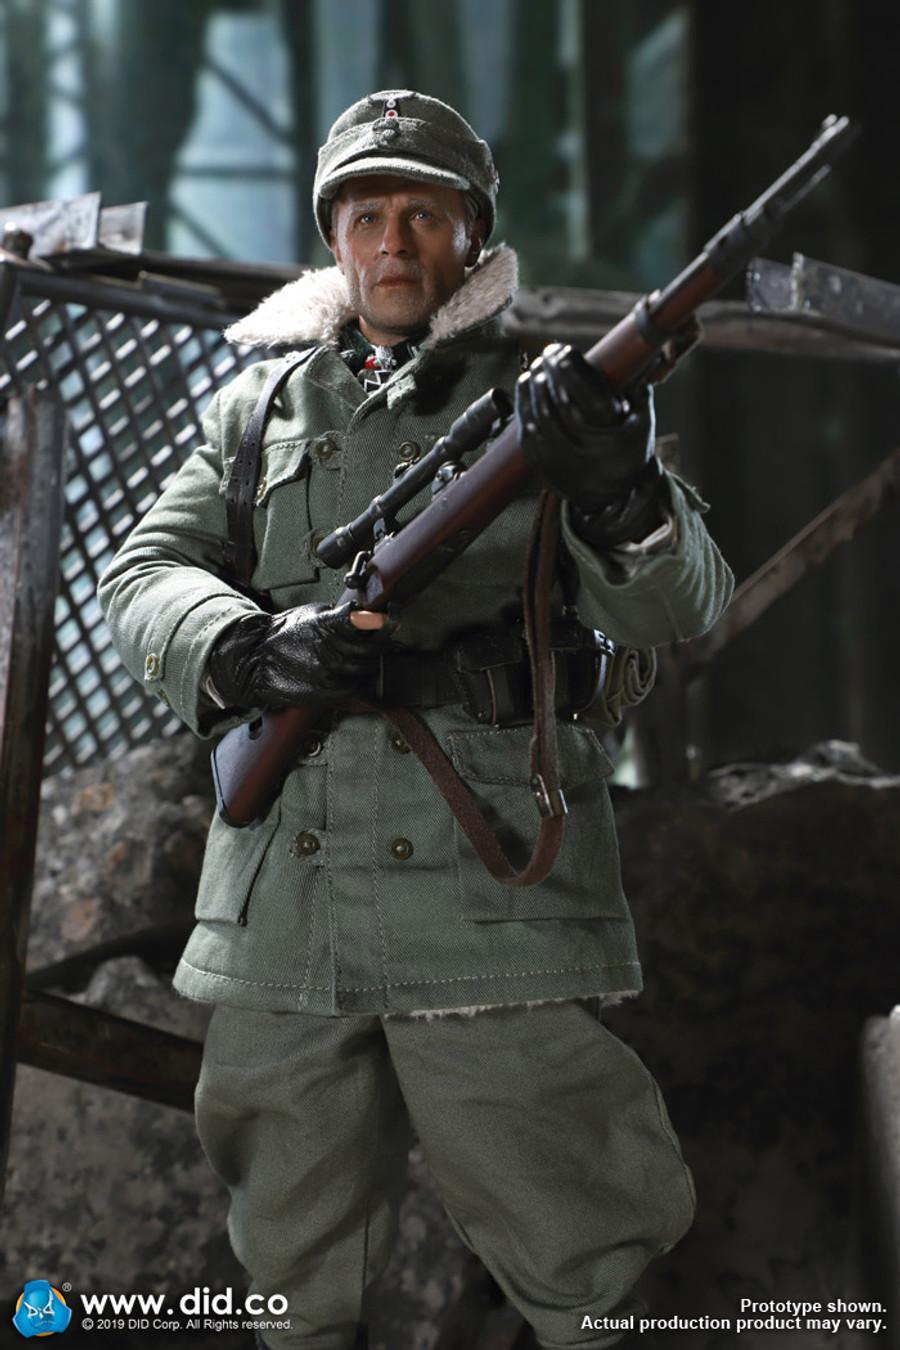 DID - WWII German Battle of Stalingrad 1942 - Major Erwin König